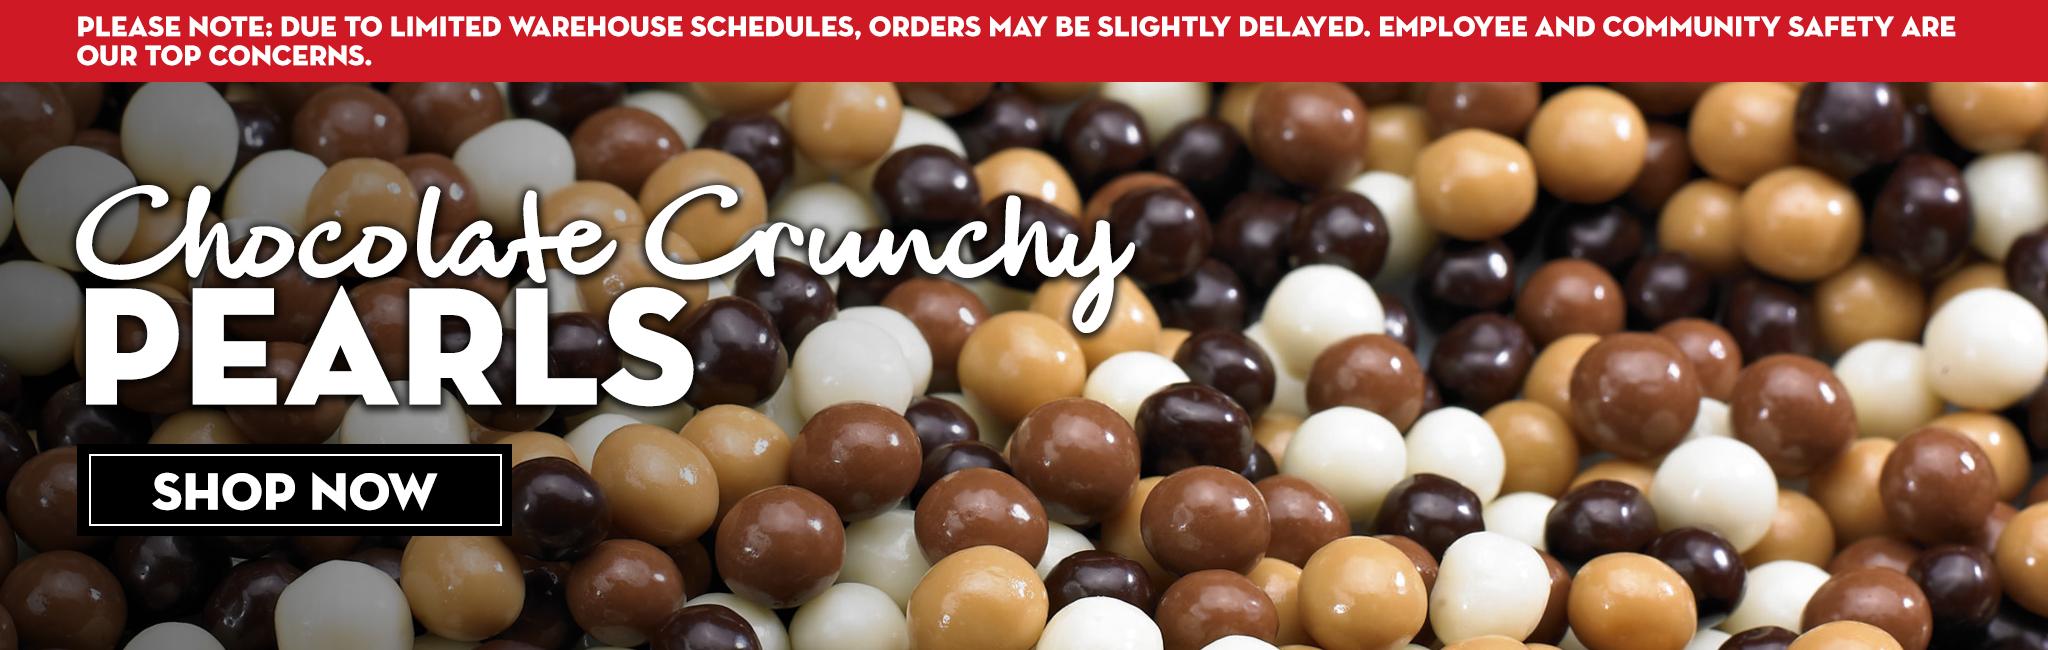 CHOCOLATE CRUNCHY PEARLS